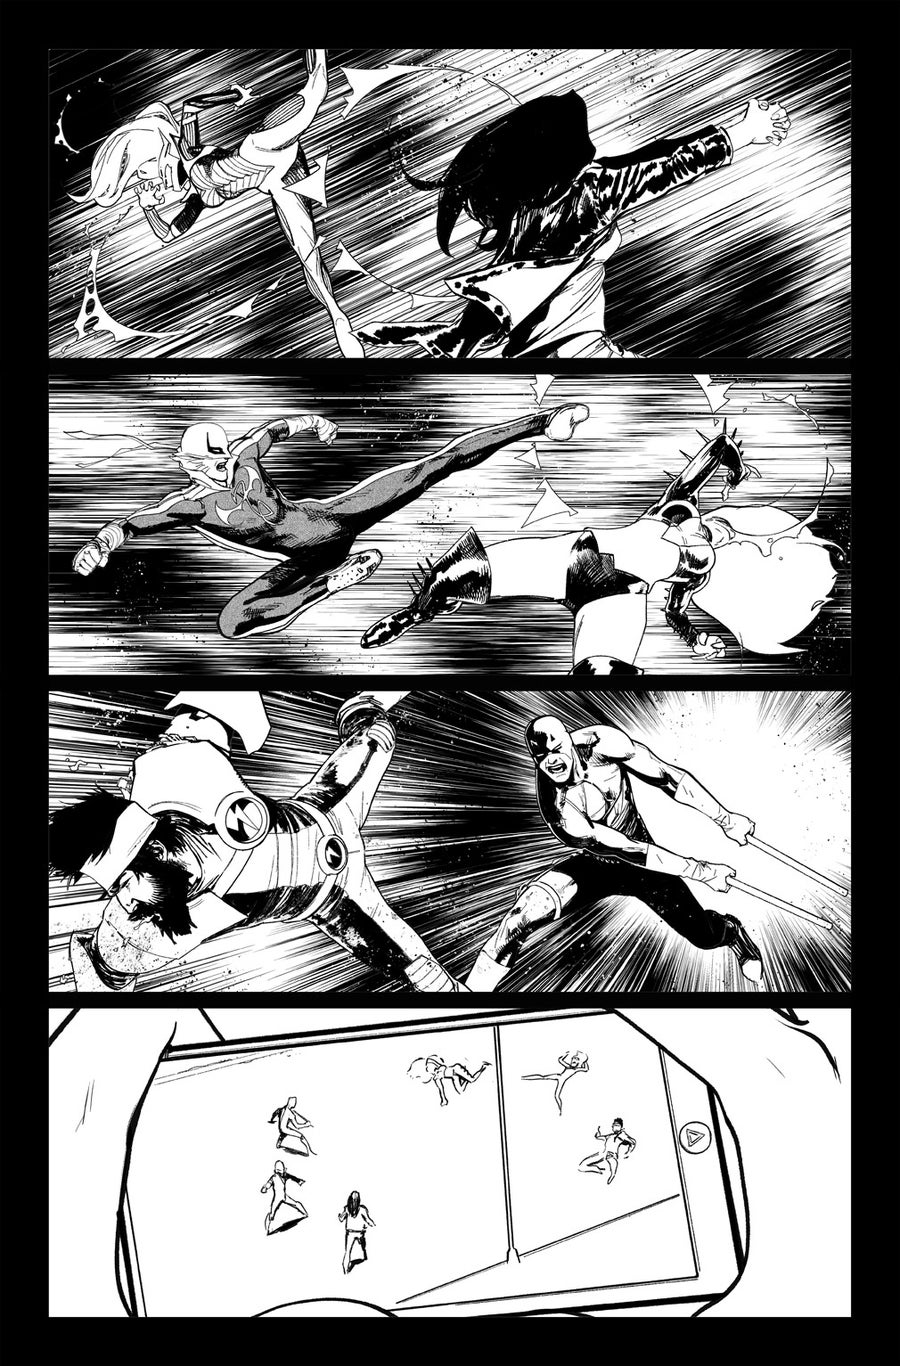 Image of DEFENDERS #9, p.14 ARTIST'S PROOF